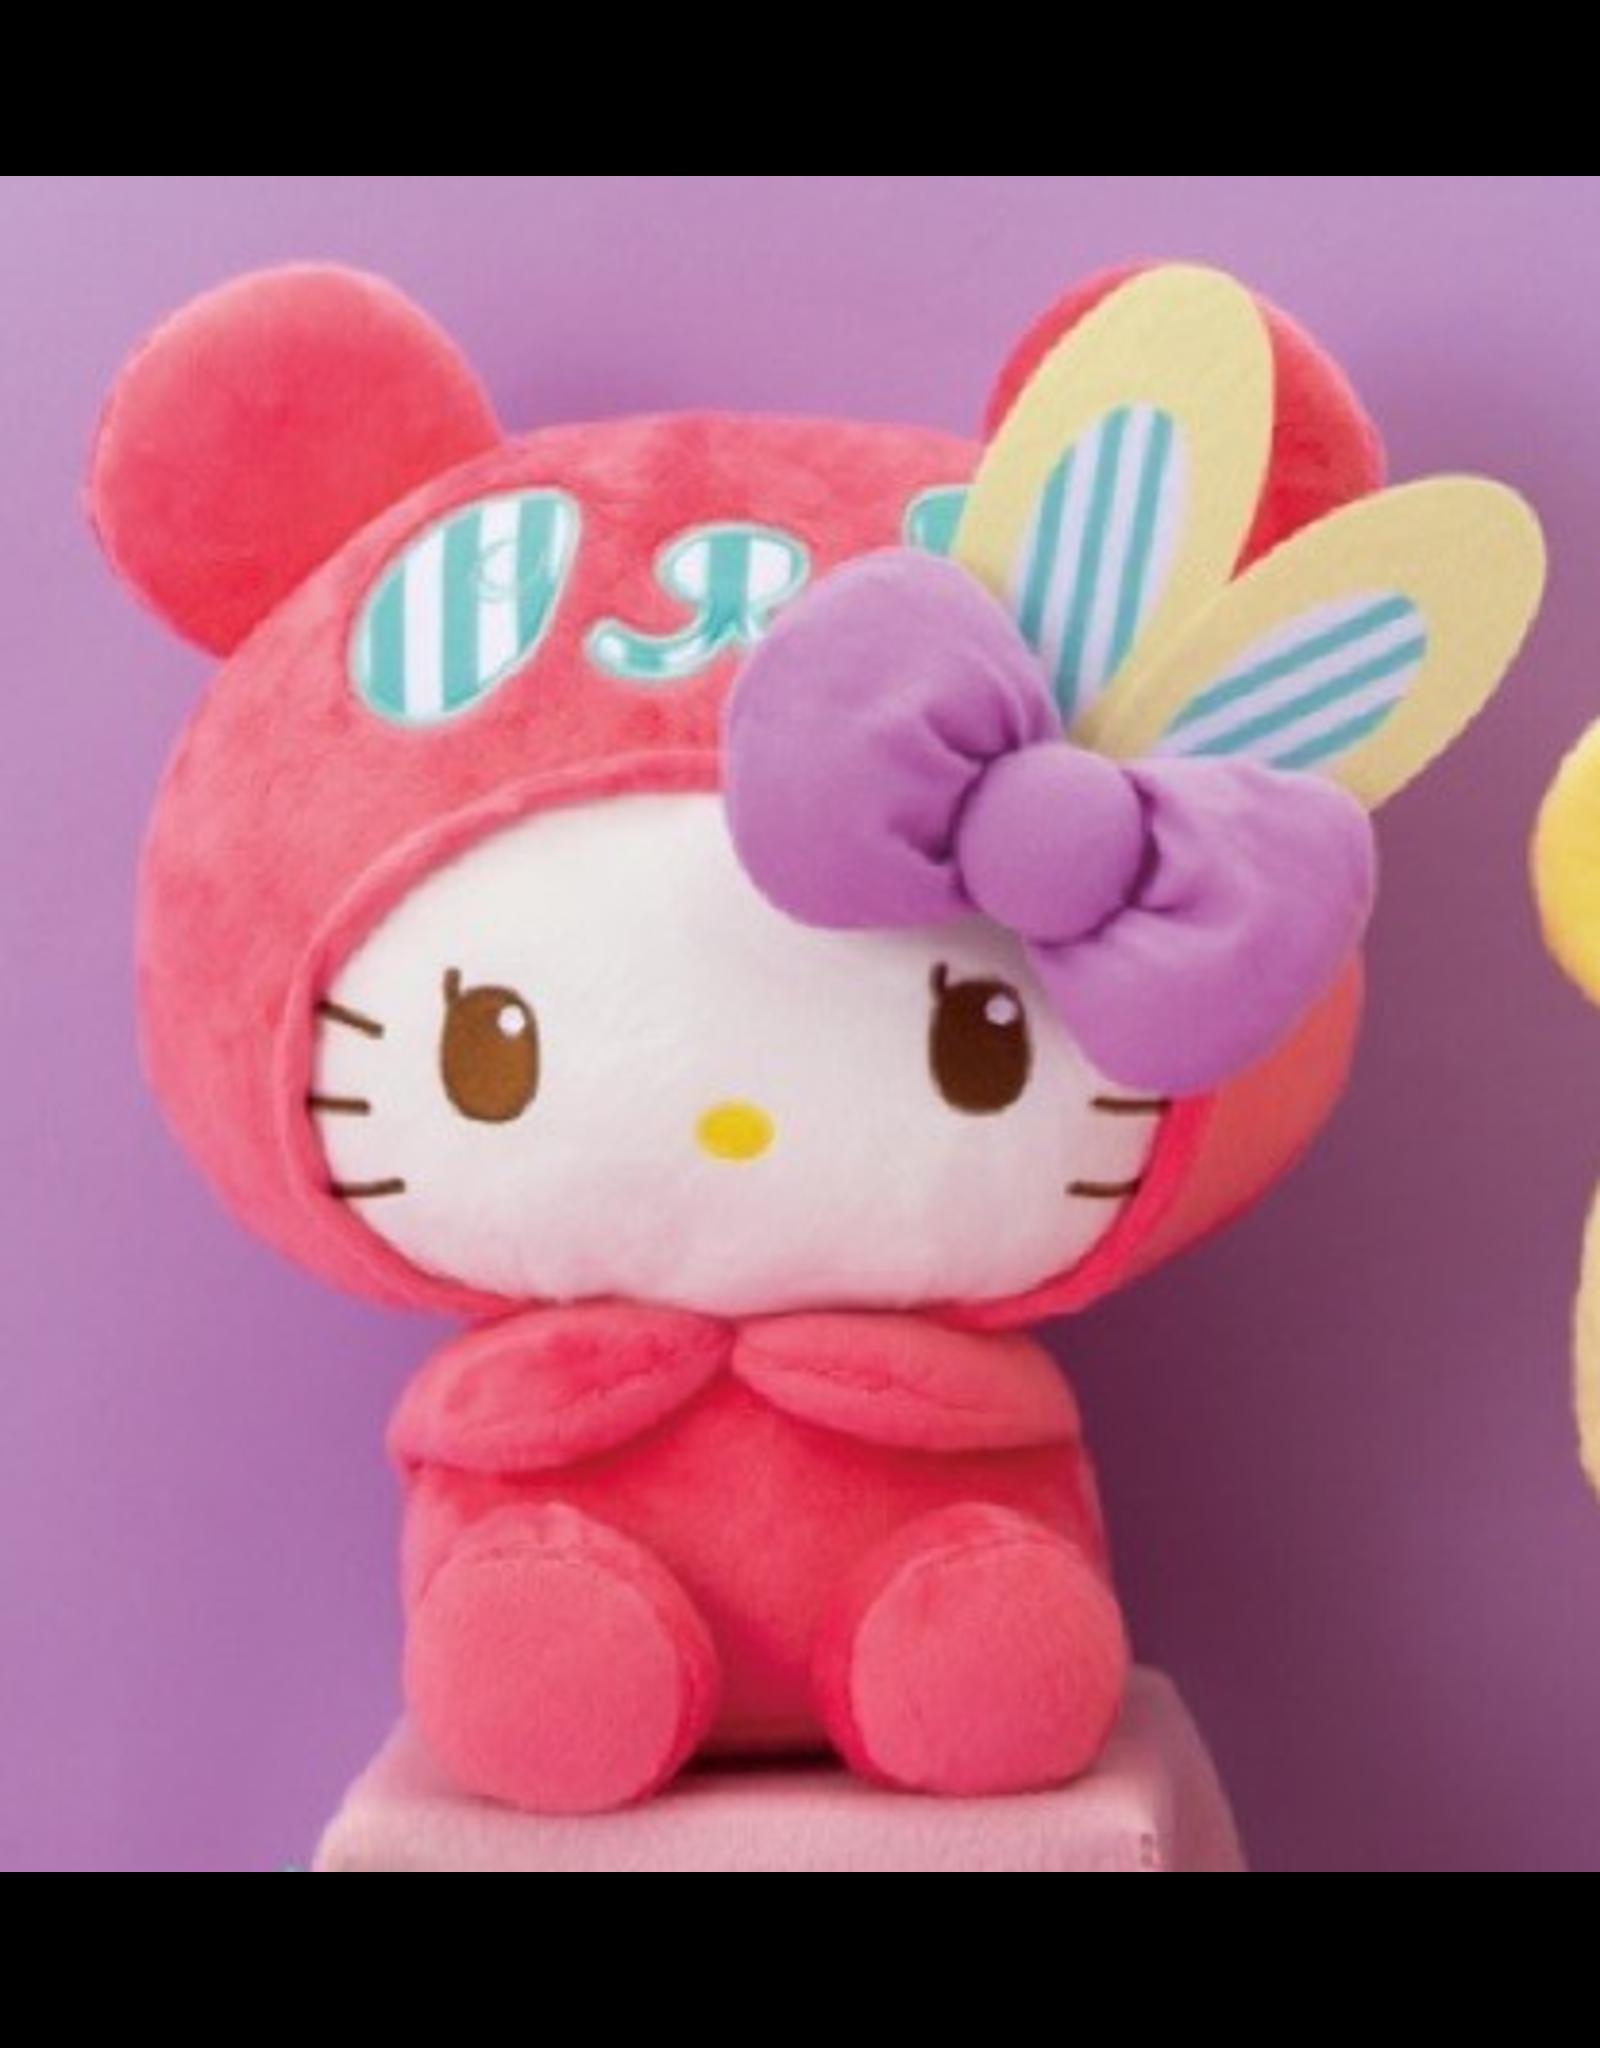 Sanrio Panda Hello Kitty BIG plush - 35 cm - Pink